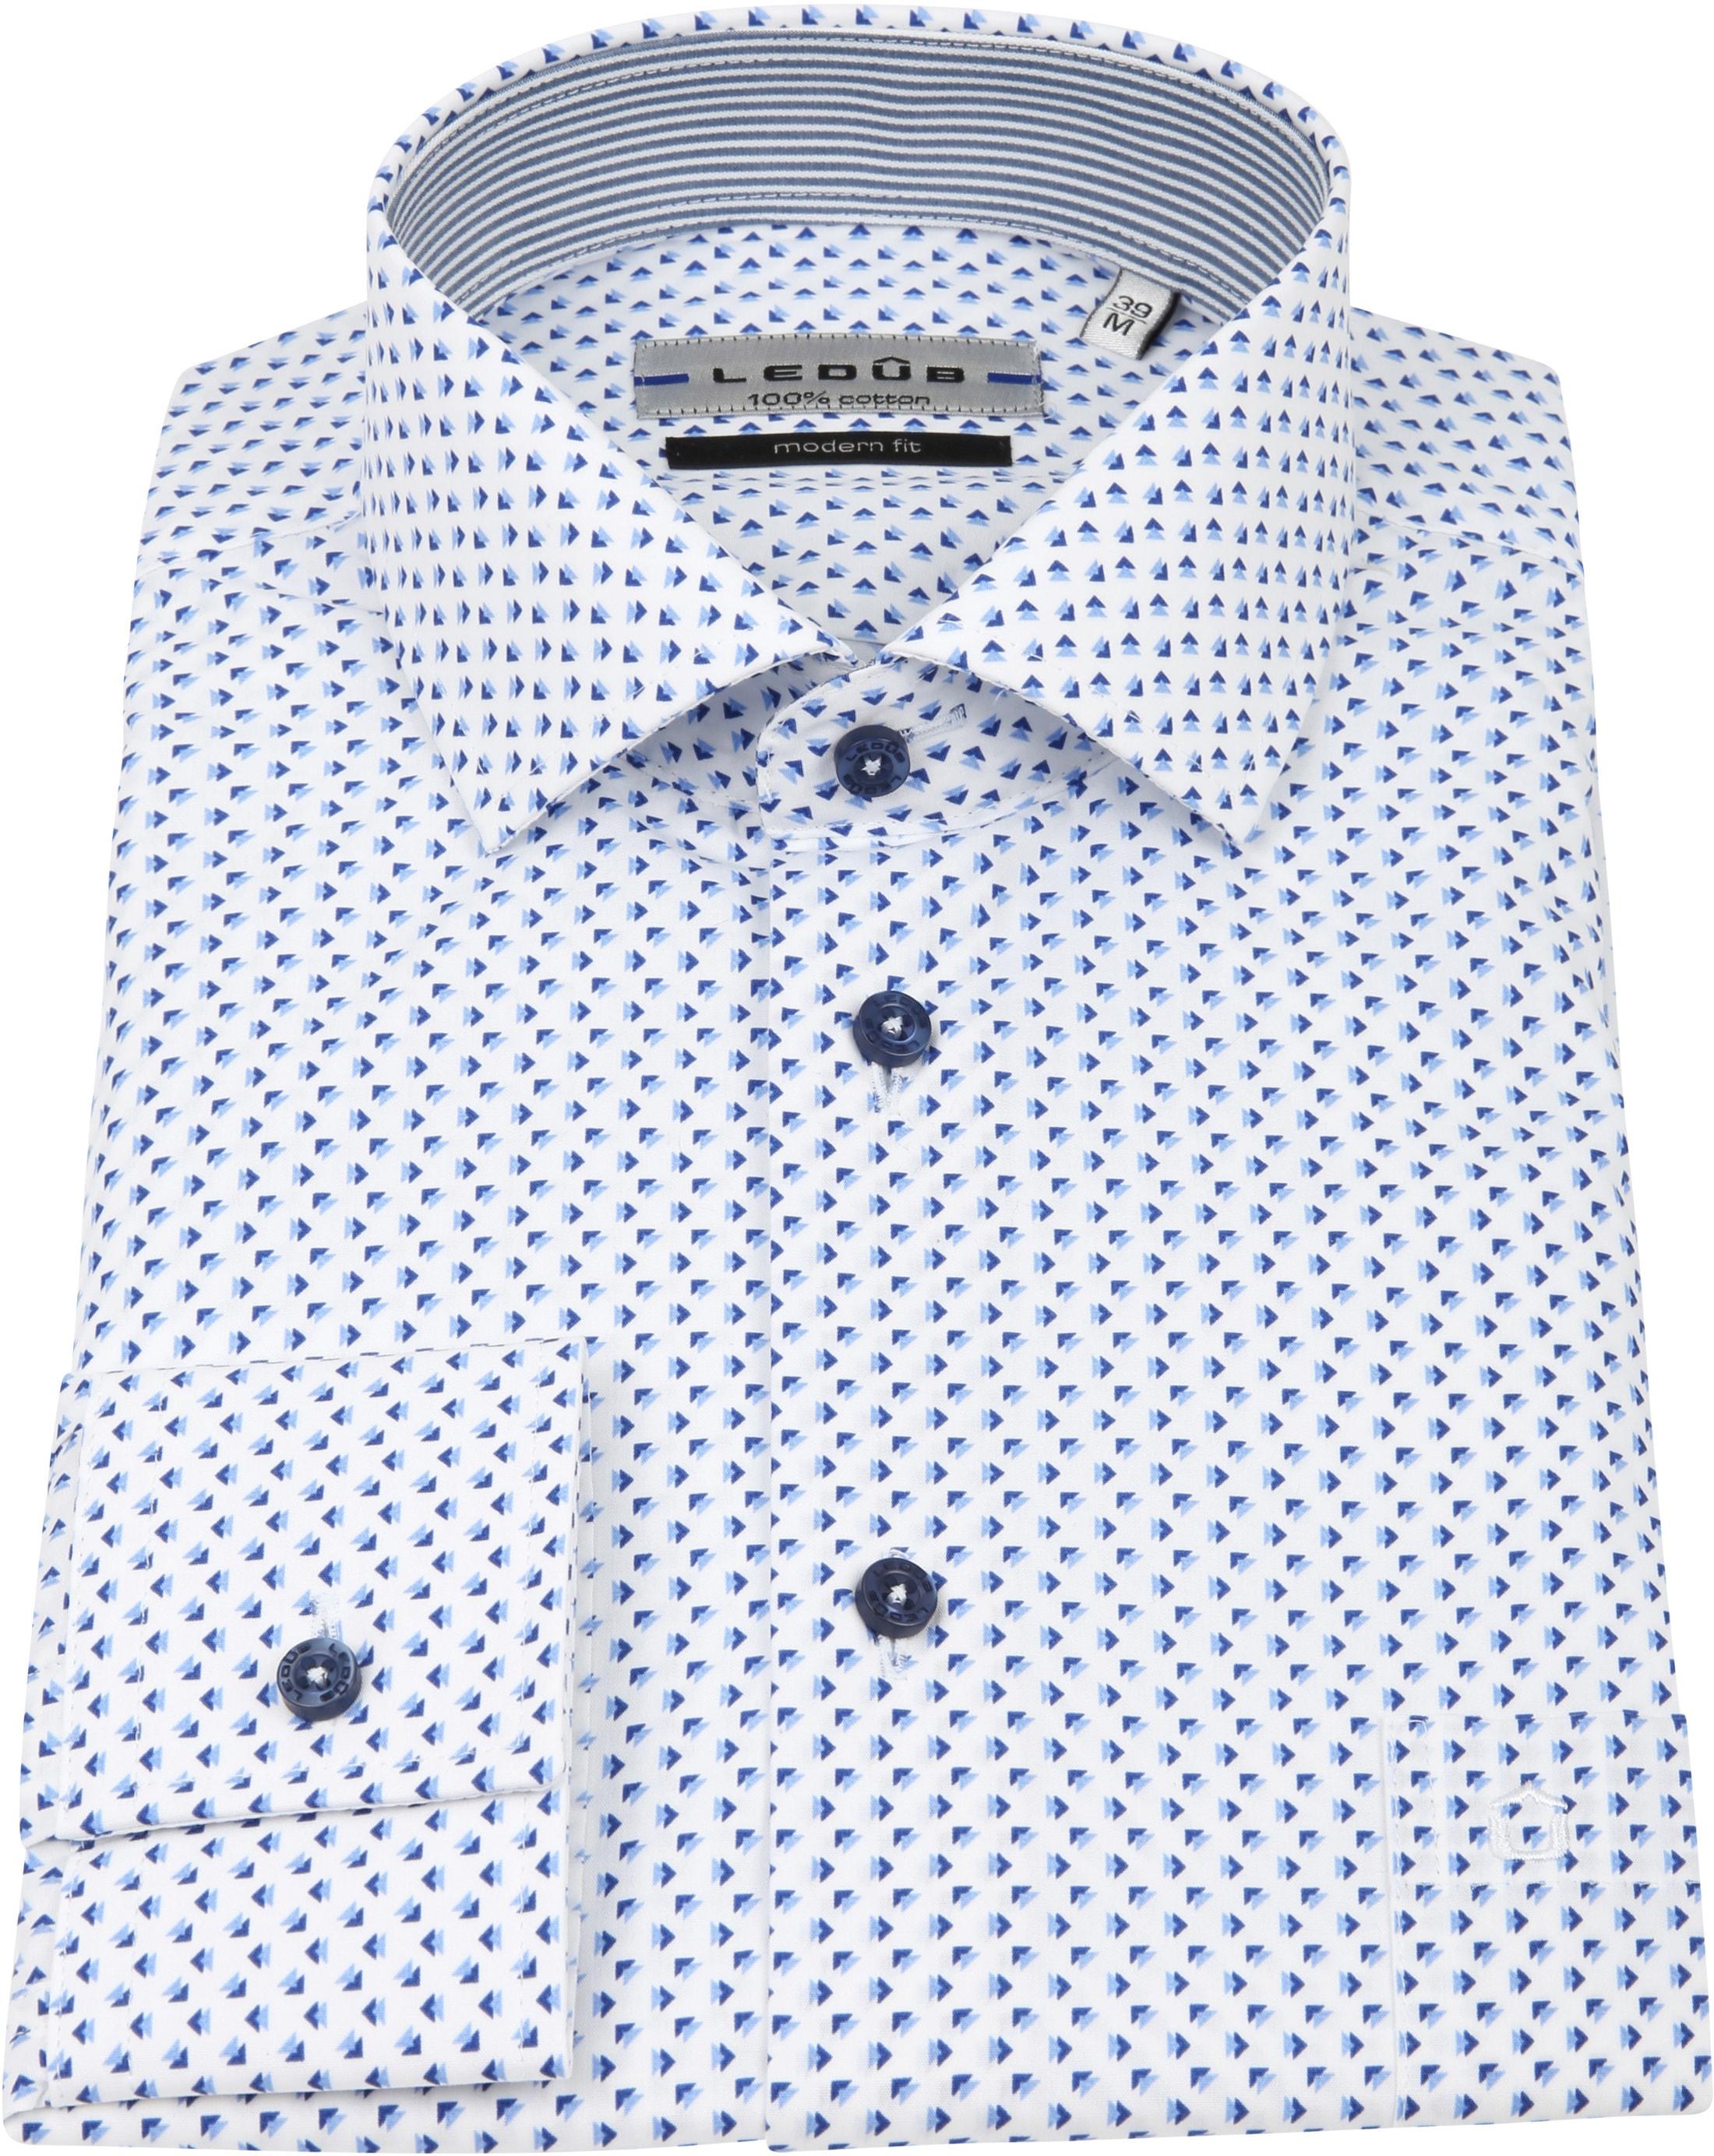 Ledub Overhemd Patroon Blauw foto 2